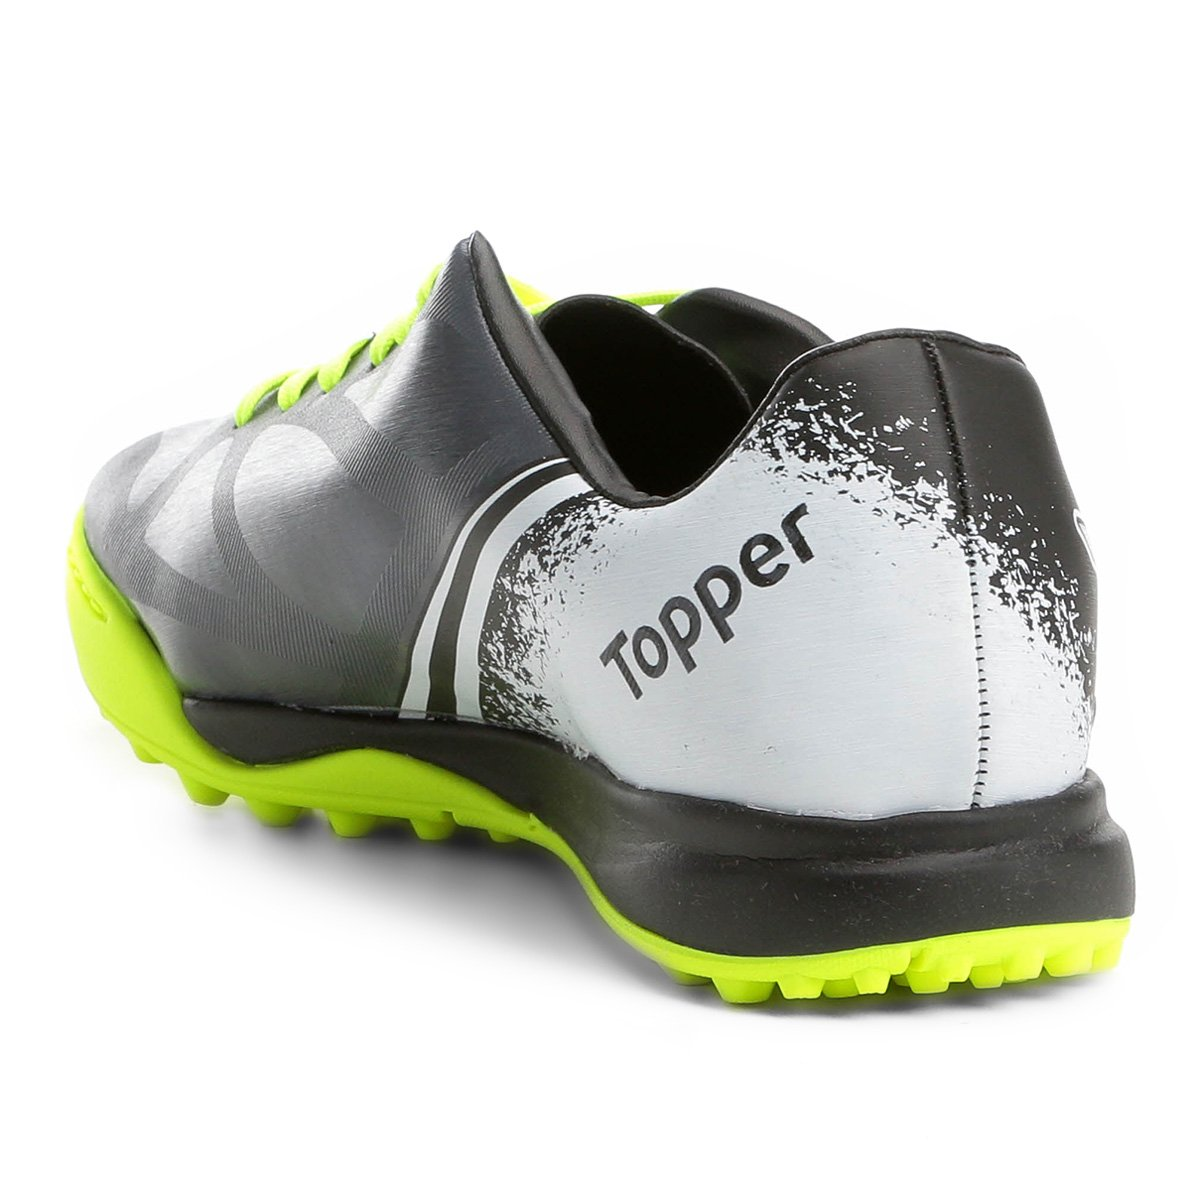 Chuteira Society Topper Trivela - Preto e Chumbo - Compre Agora ... 092d0fa401d1c